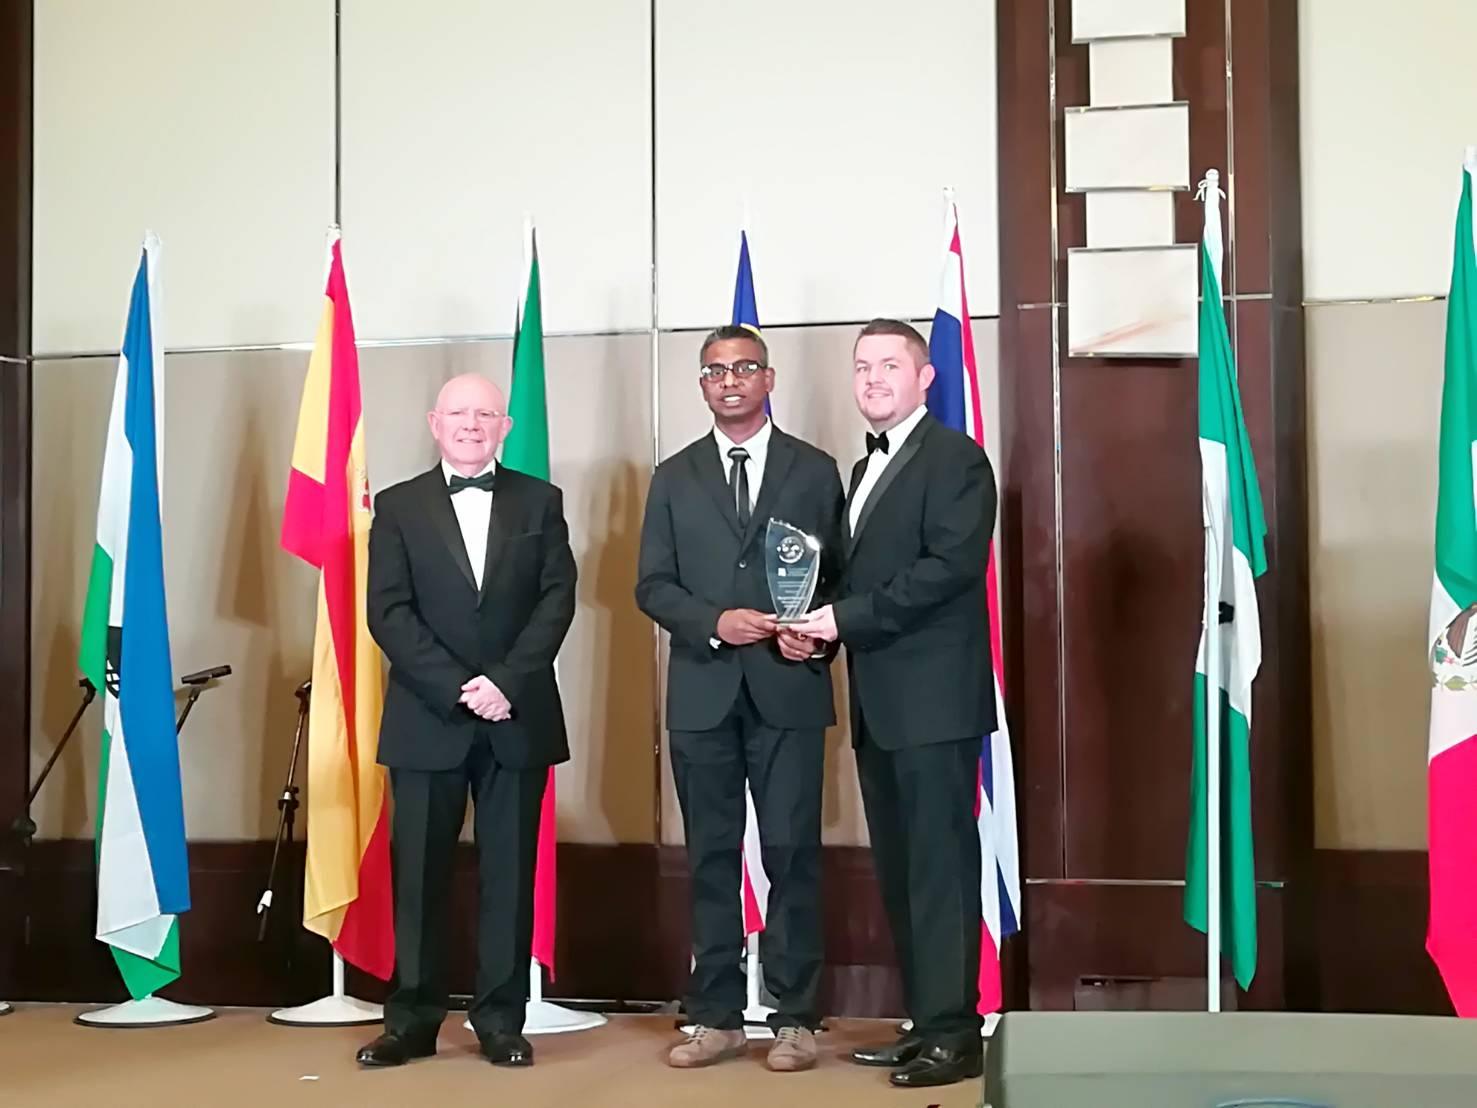 ASIC 10th Anniversary International Education Awards!